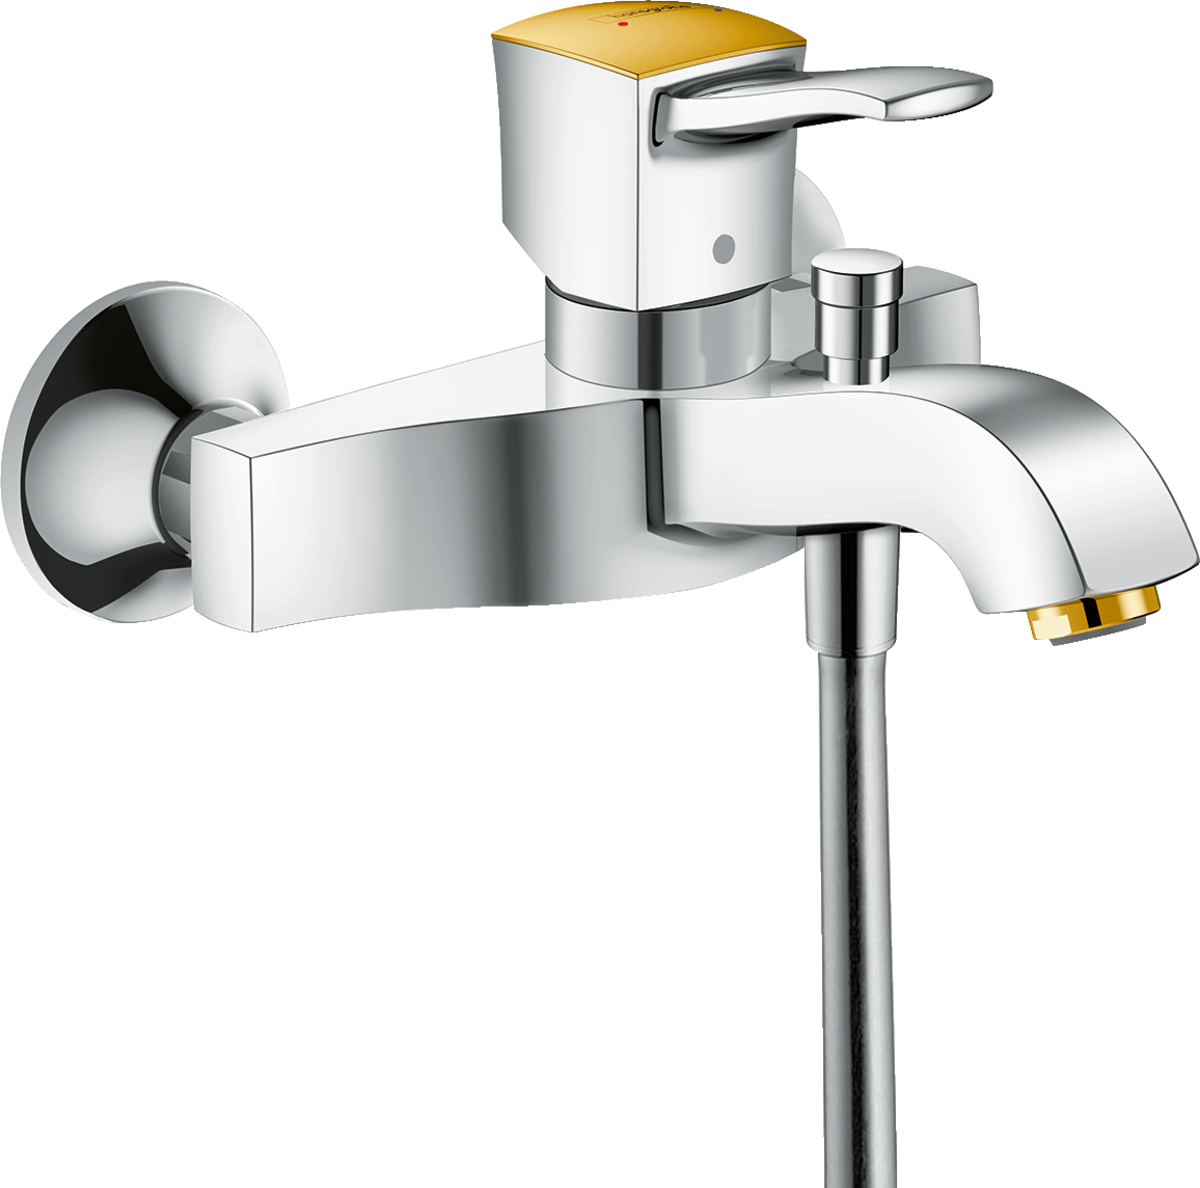 Mitigeur de bain / douche Hansgrohe Metropol Classic